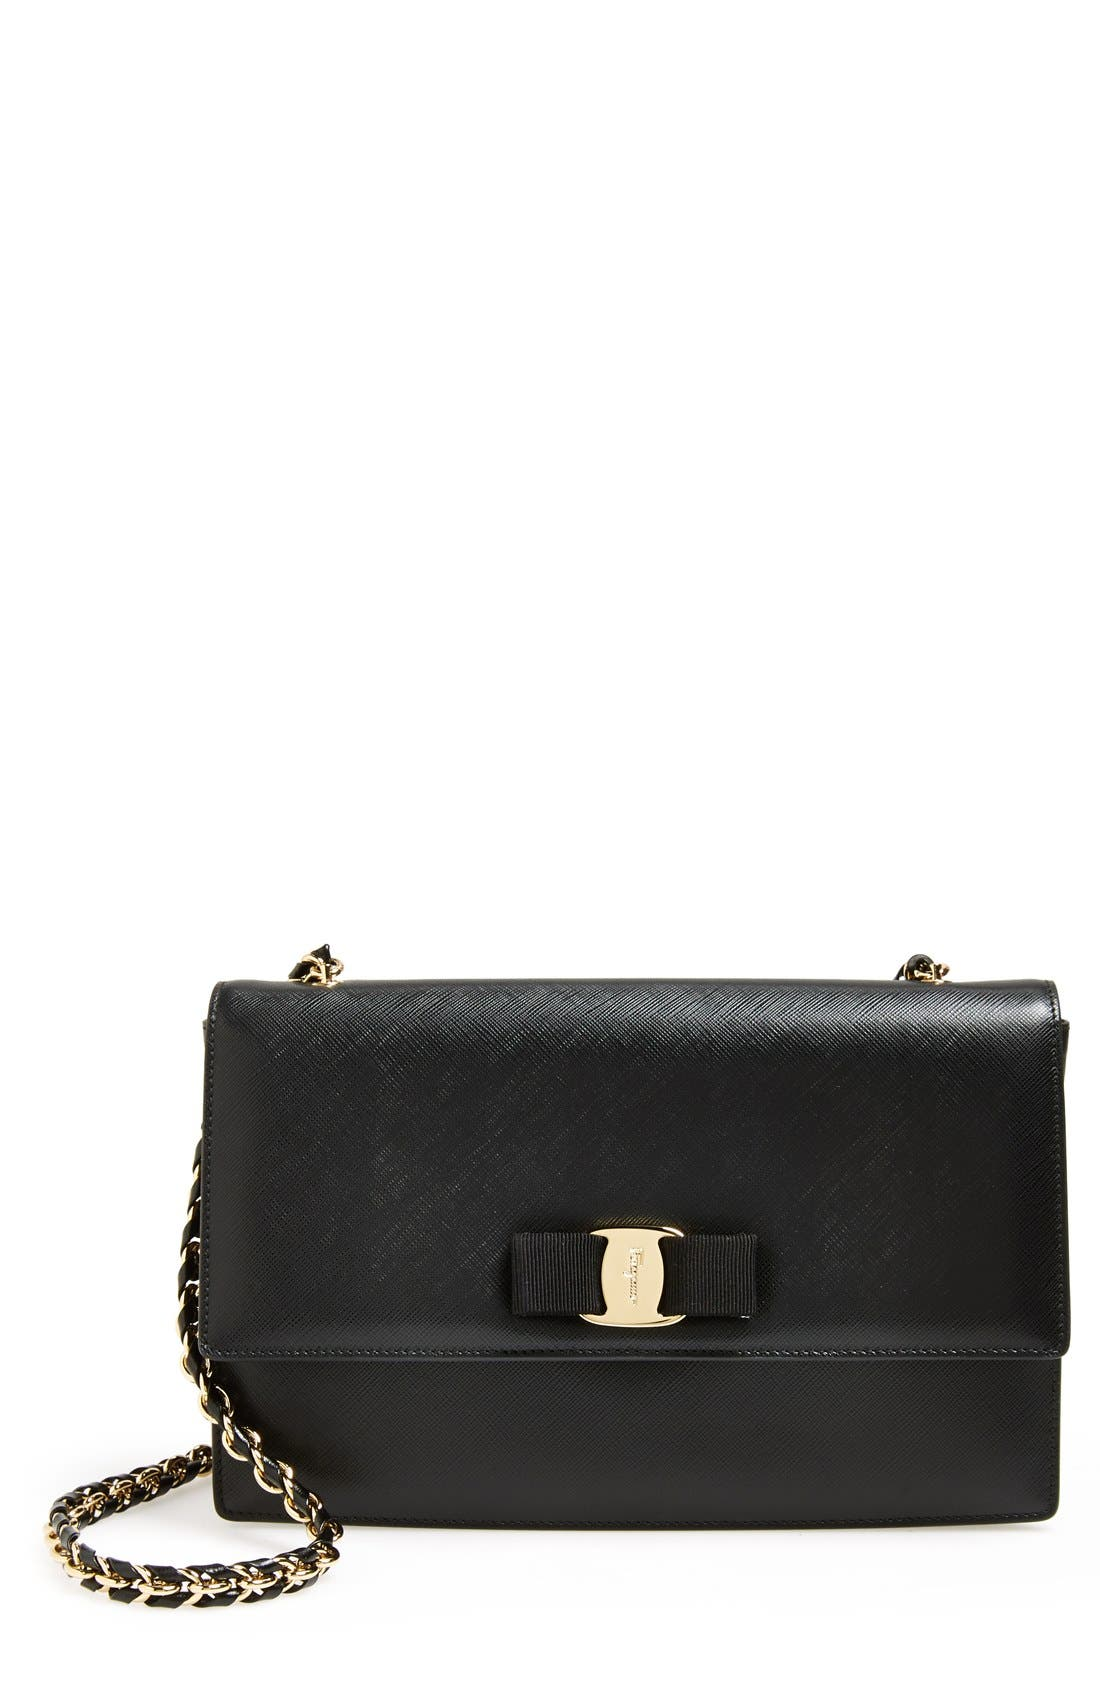 Saffiano Leather Shoulder Bag,                             Main thumbnail 1, color,                             Nero